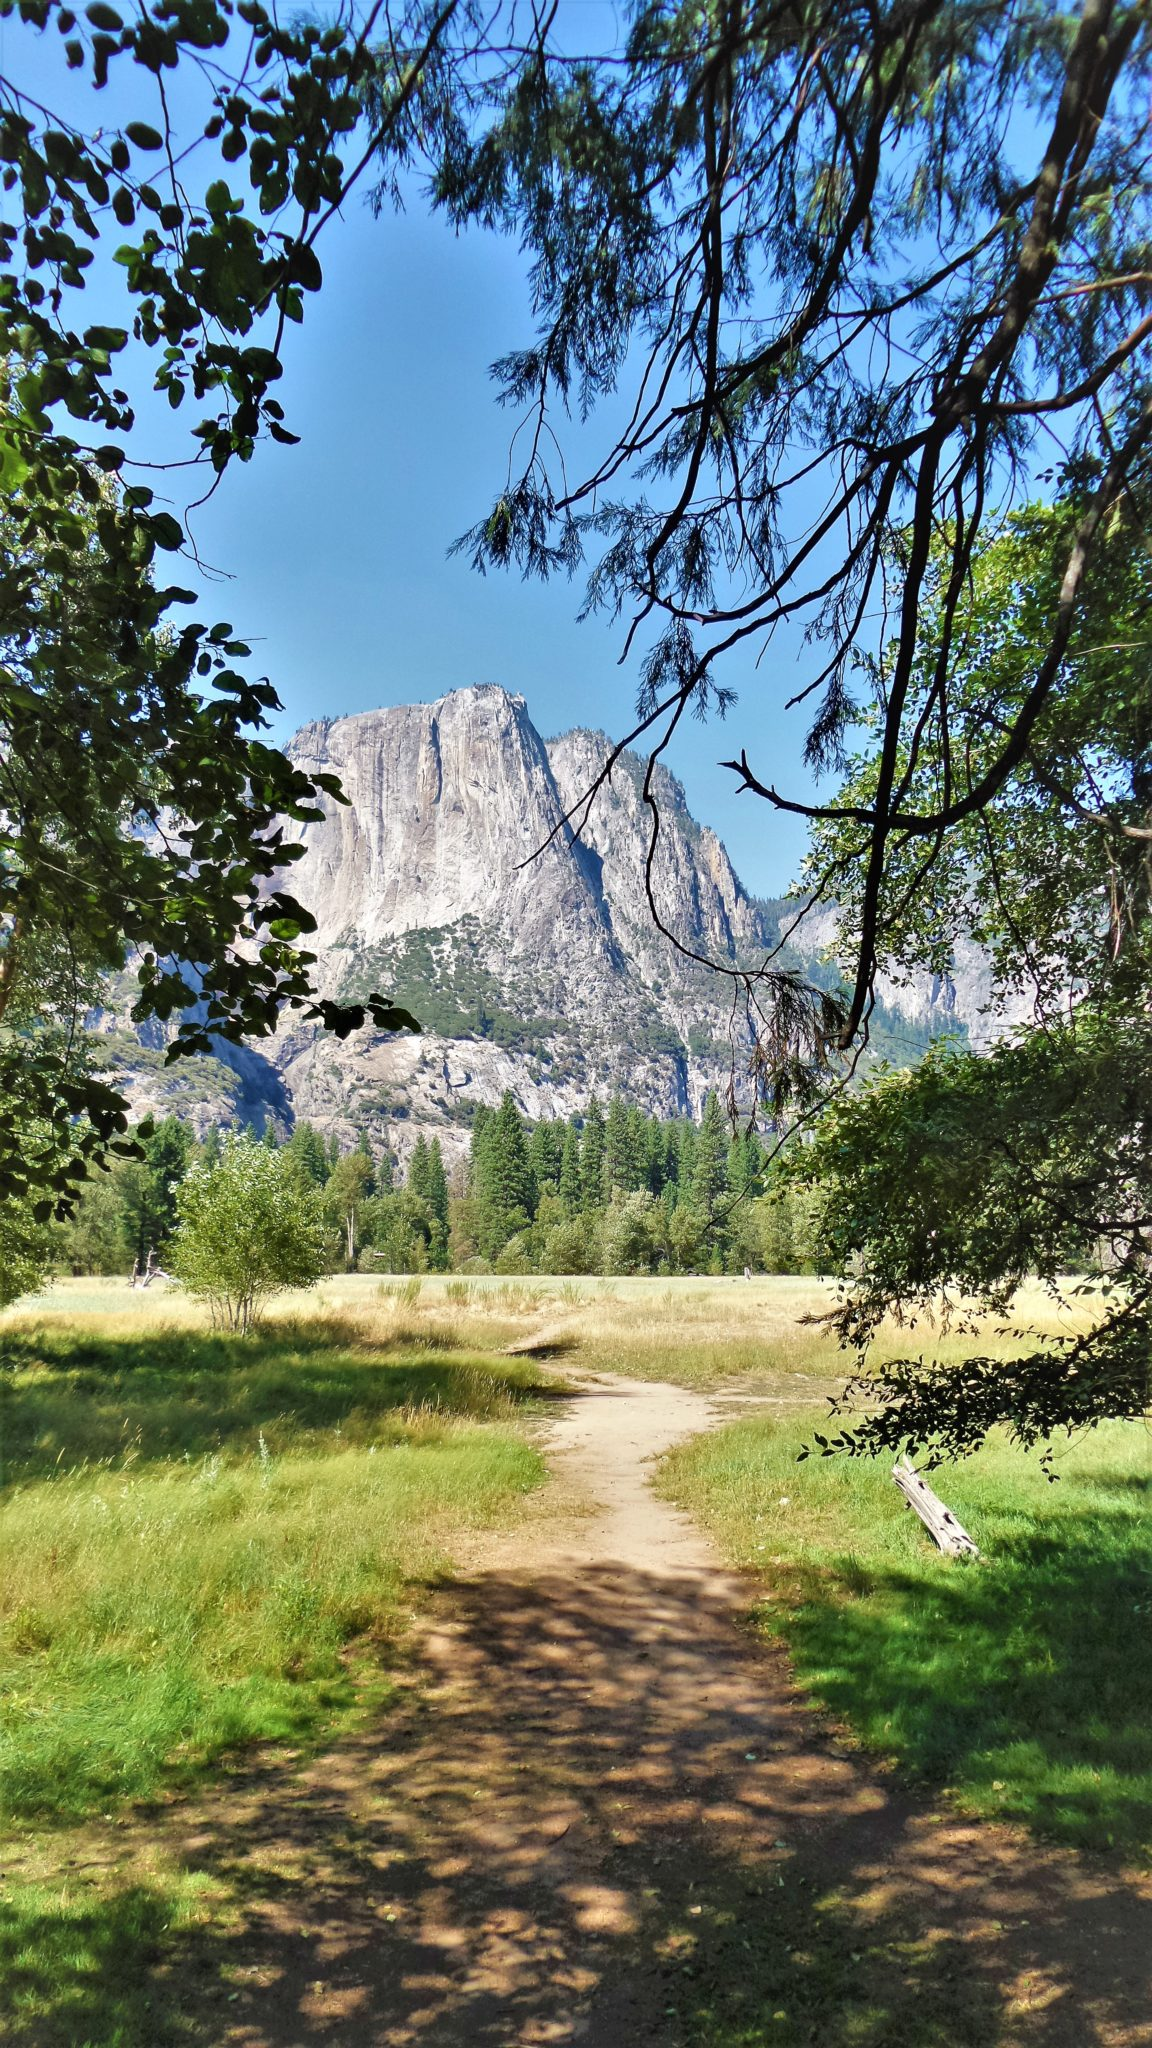 Cliff view through trees, Yosemite National Park, California